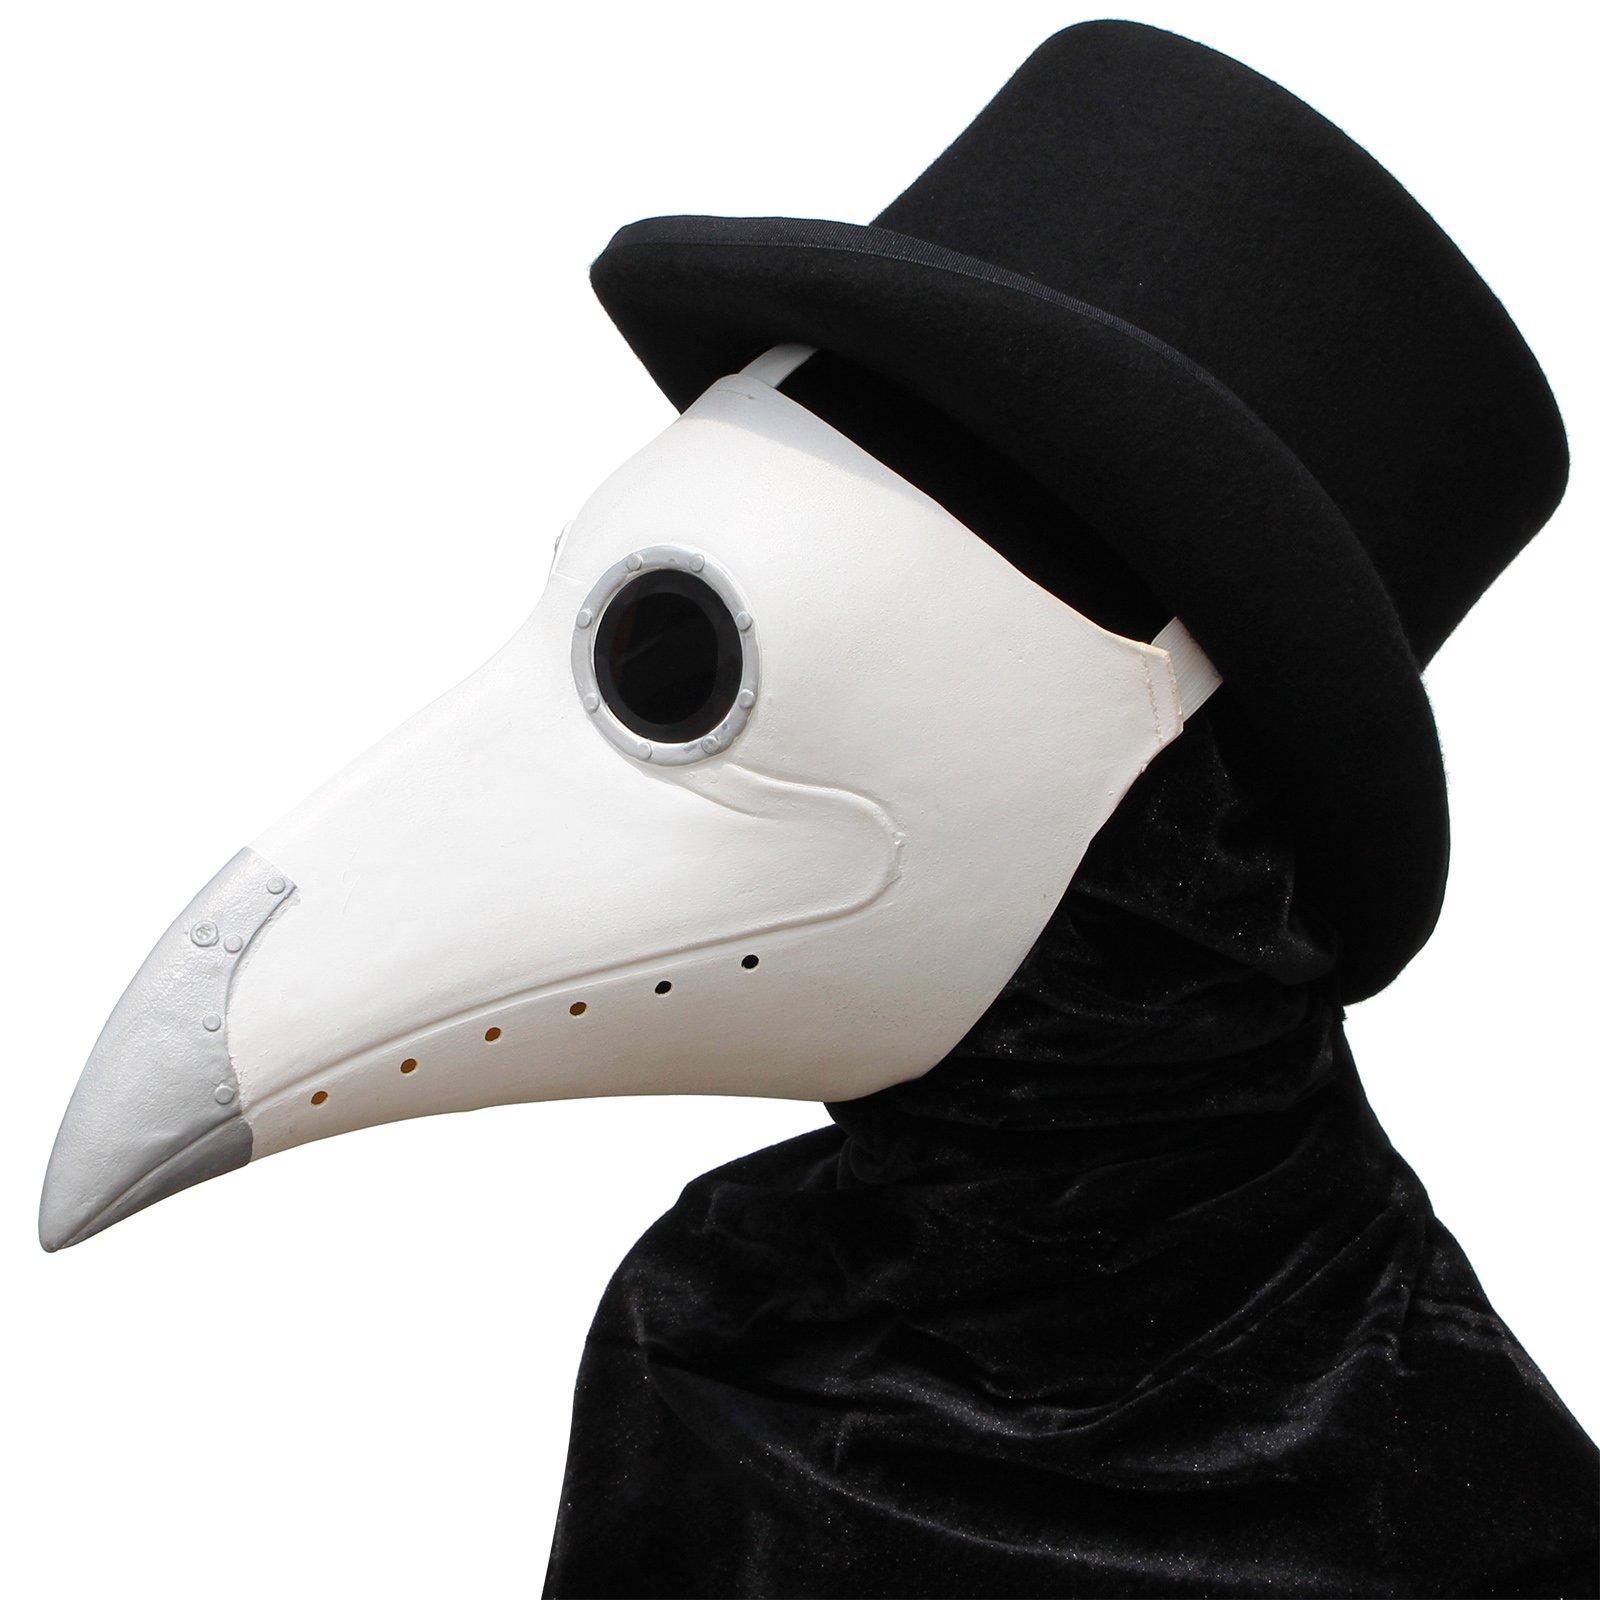 PartyHop - White Plague Doctor Mask - Long Nose Bird Beak Steampunk Halloween Costume Props Mask by PartyHop